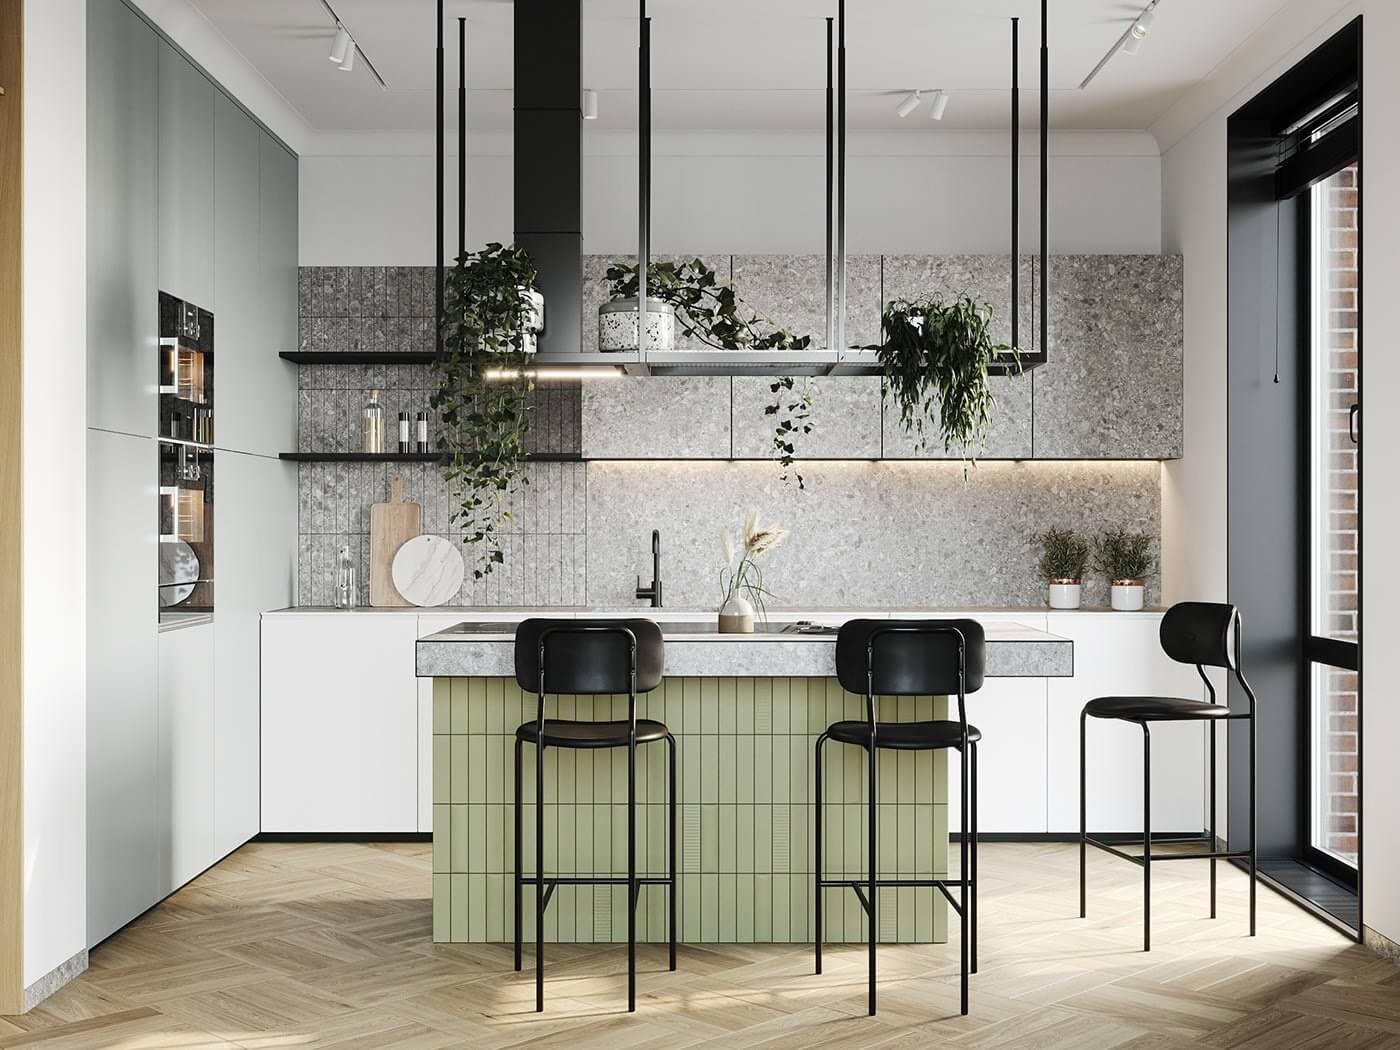 Apartment Presnya City Moscow kitchen design block - cgi visualization